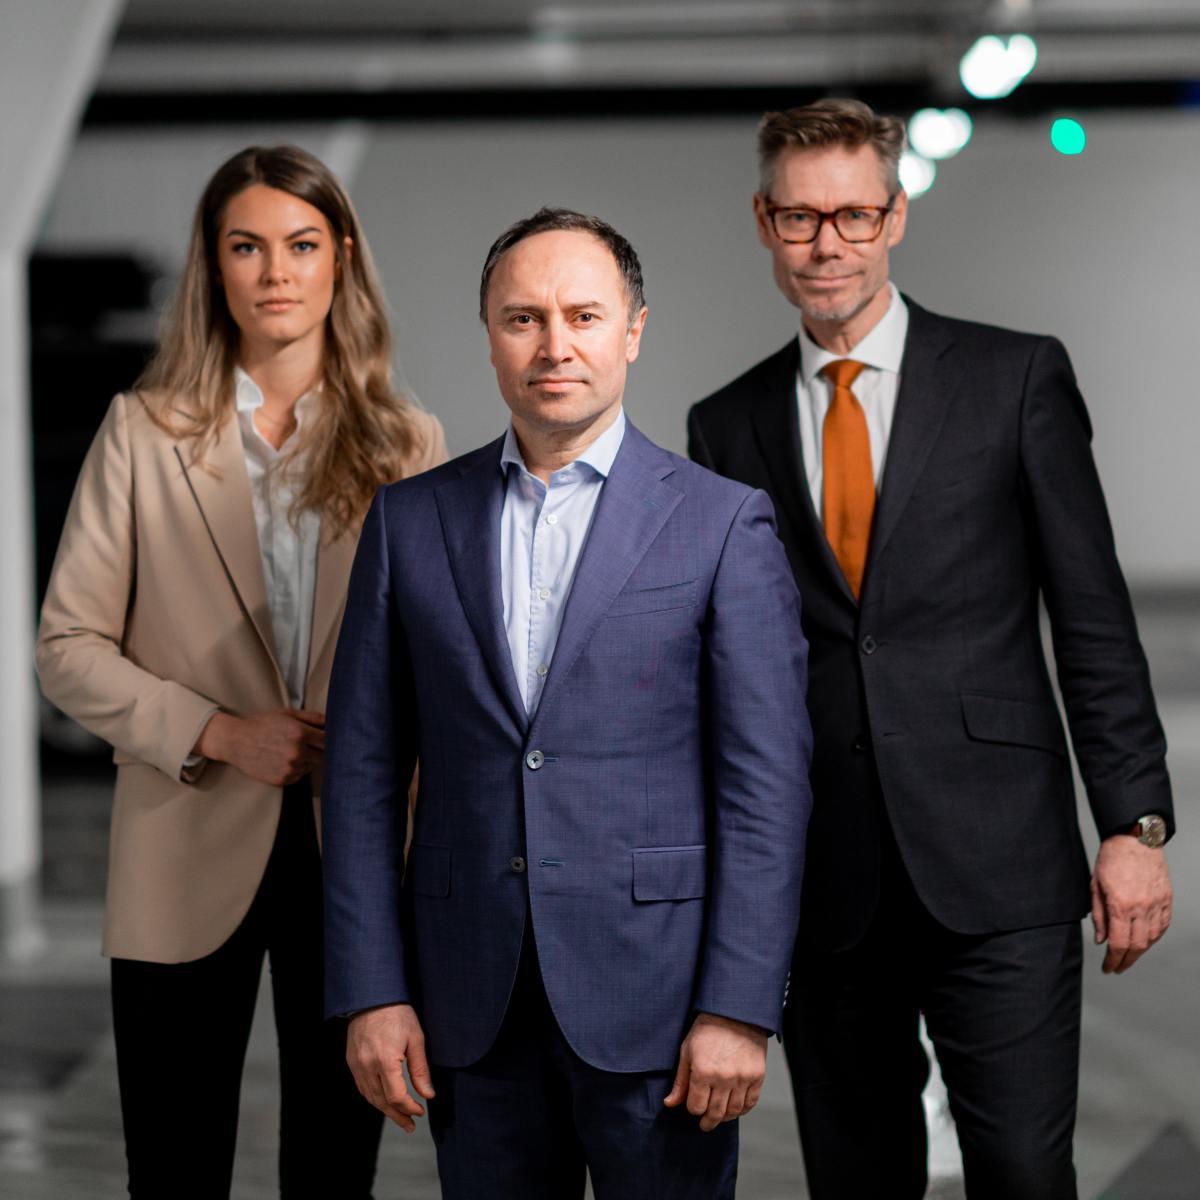 Board of Directors, Photo by Roland Samuel on Unsplash